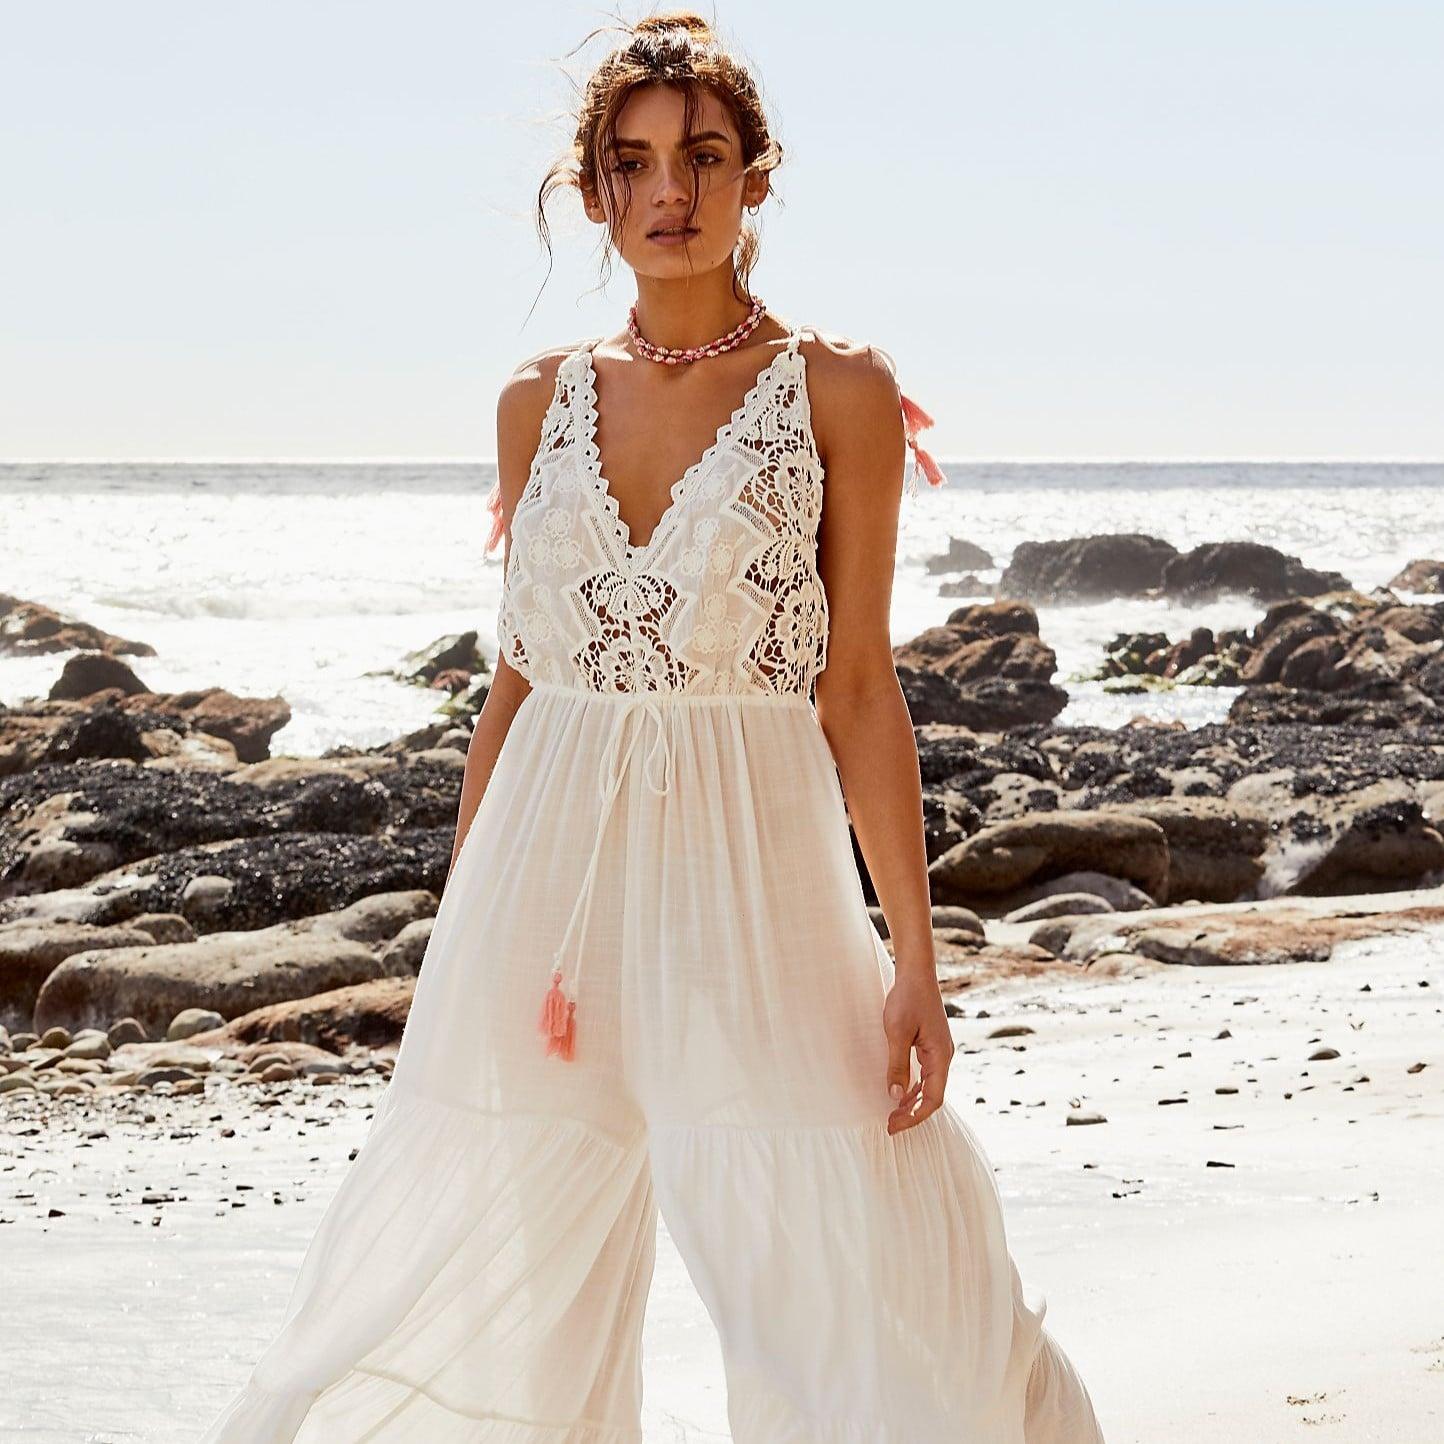 Best Beach Clothes for Women  POPSUGAR Fashion